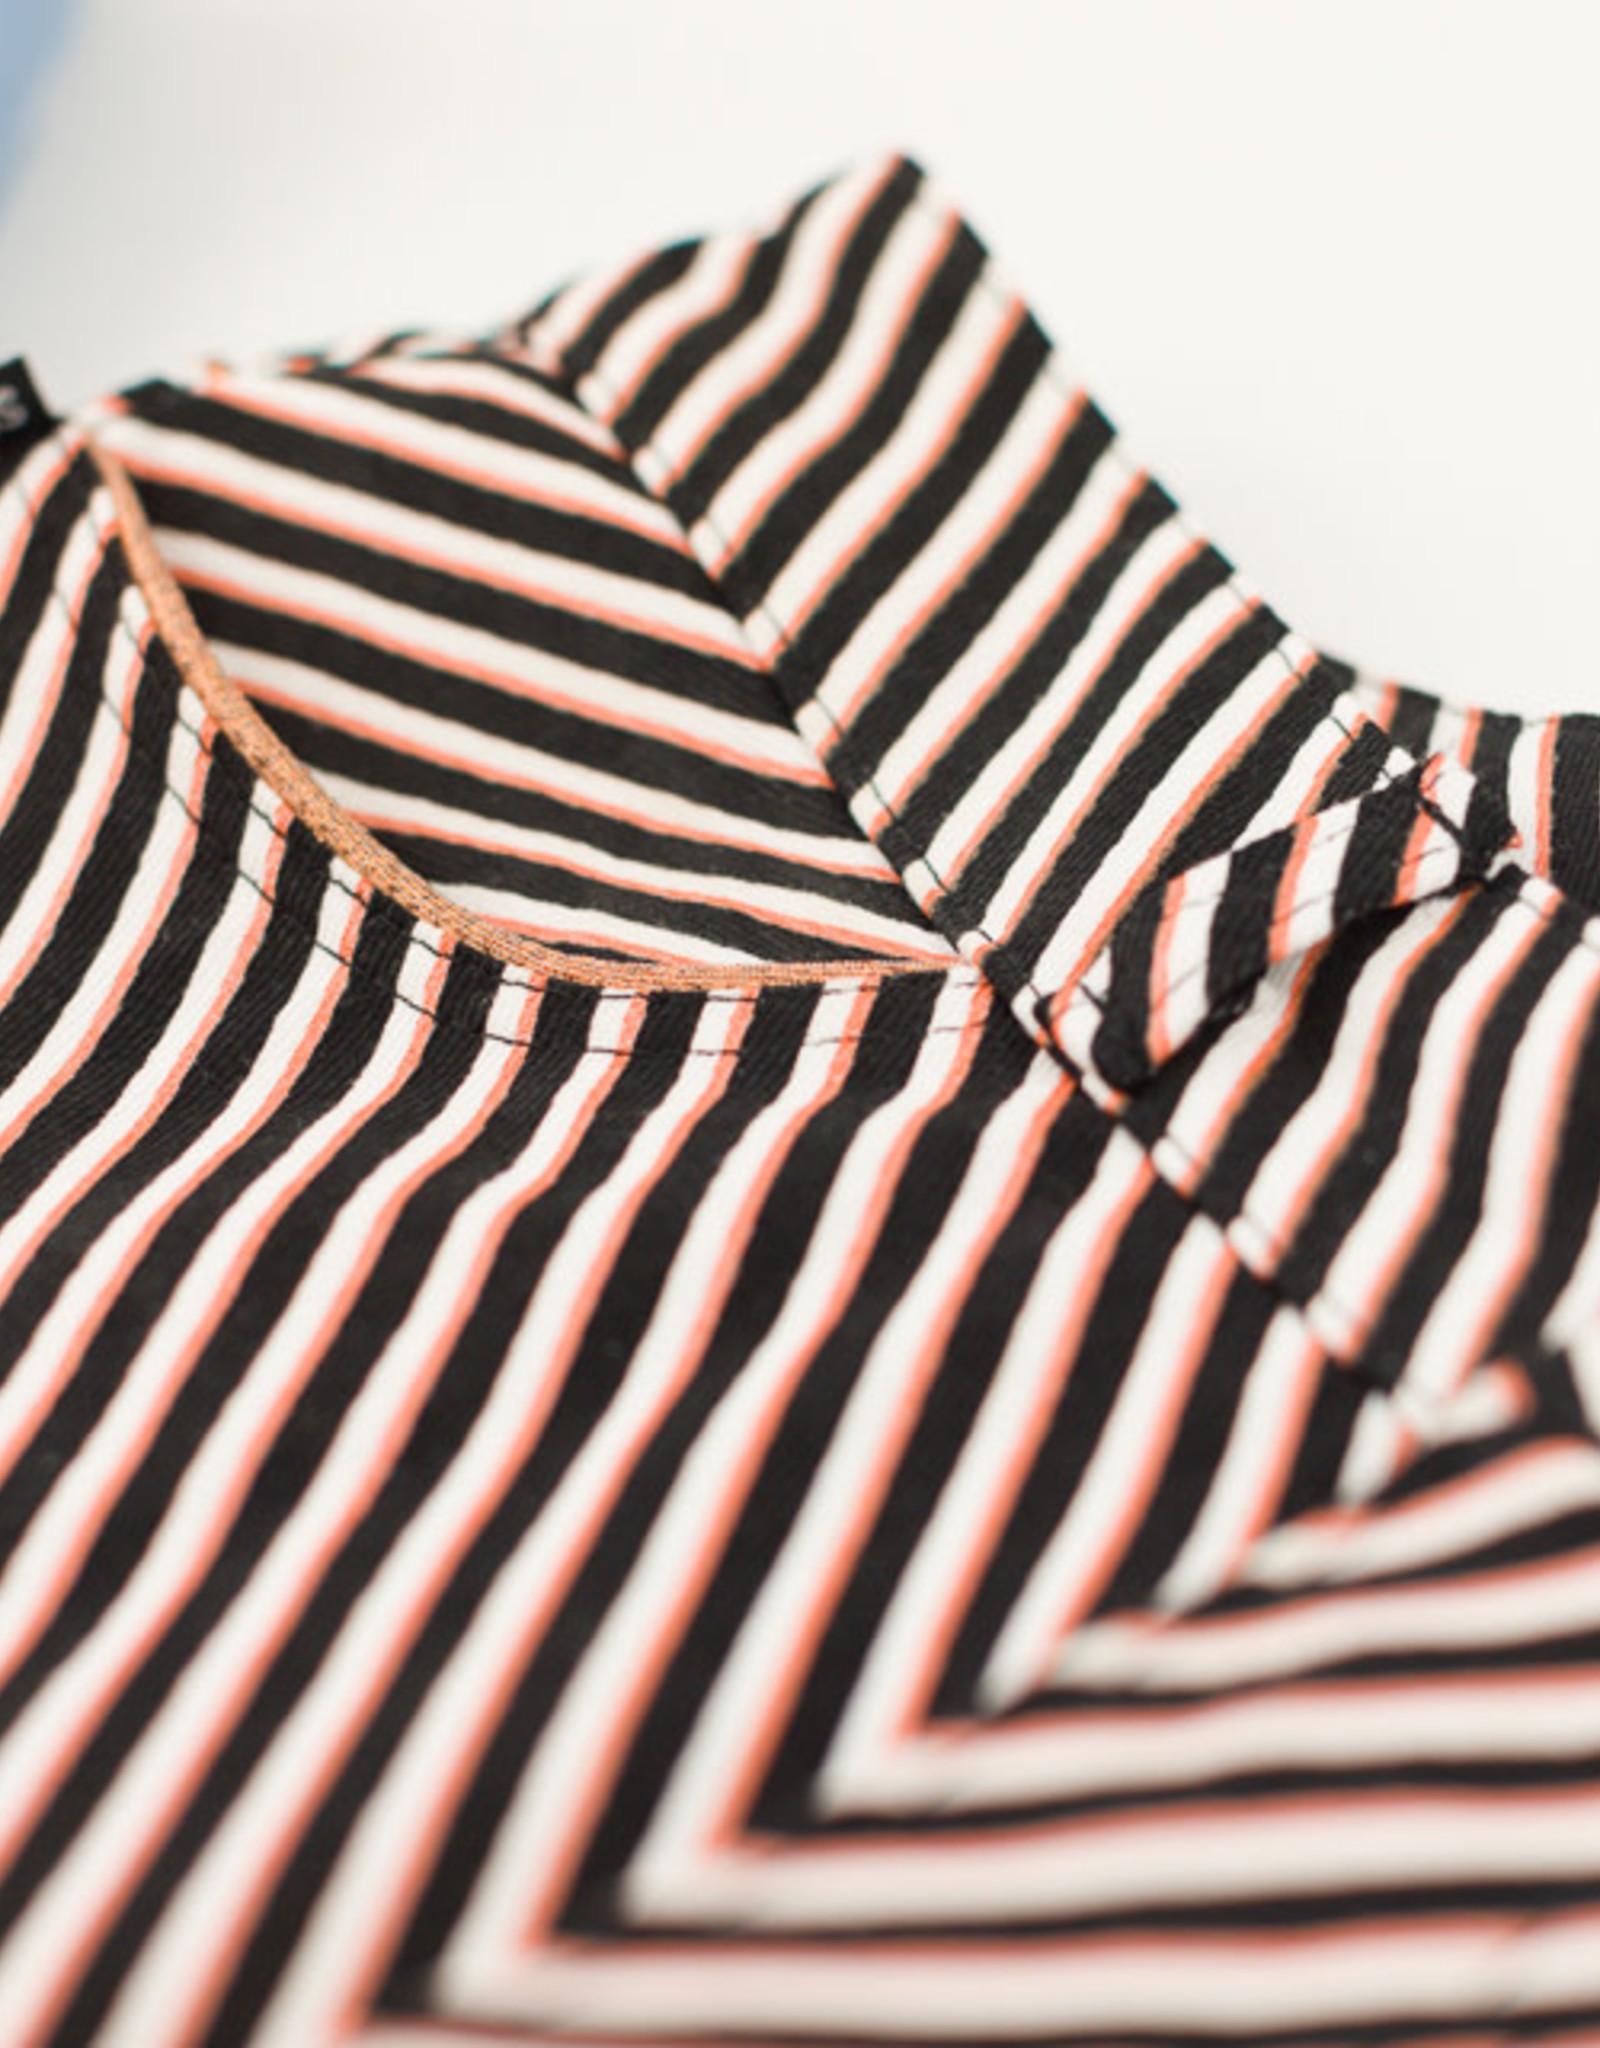 See You at Six Diagonals - M - Katoen Canvas Gabardine Twill - Zwart & Wit & Koper - R